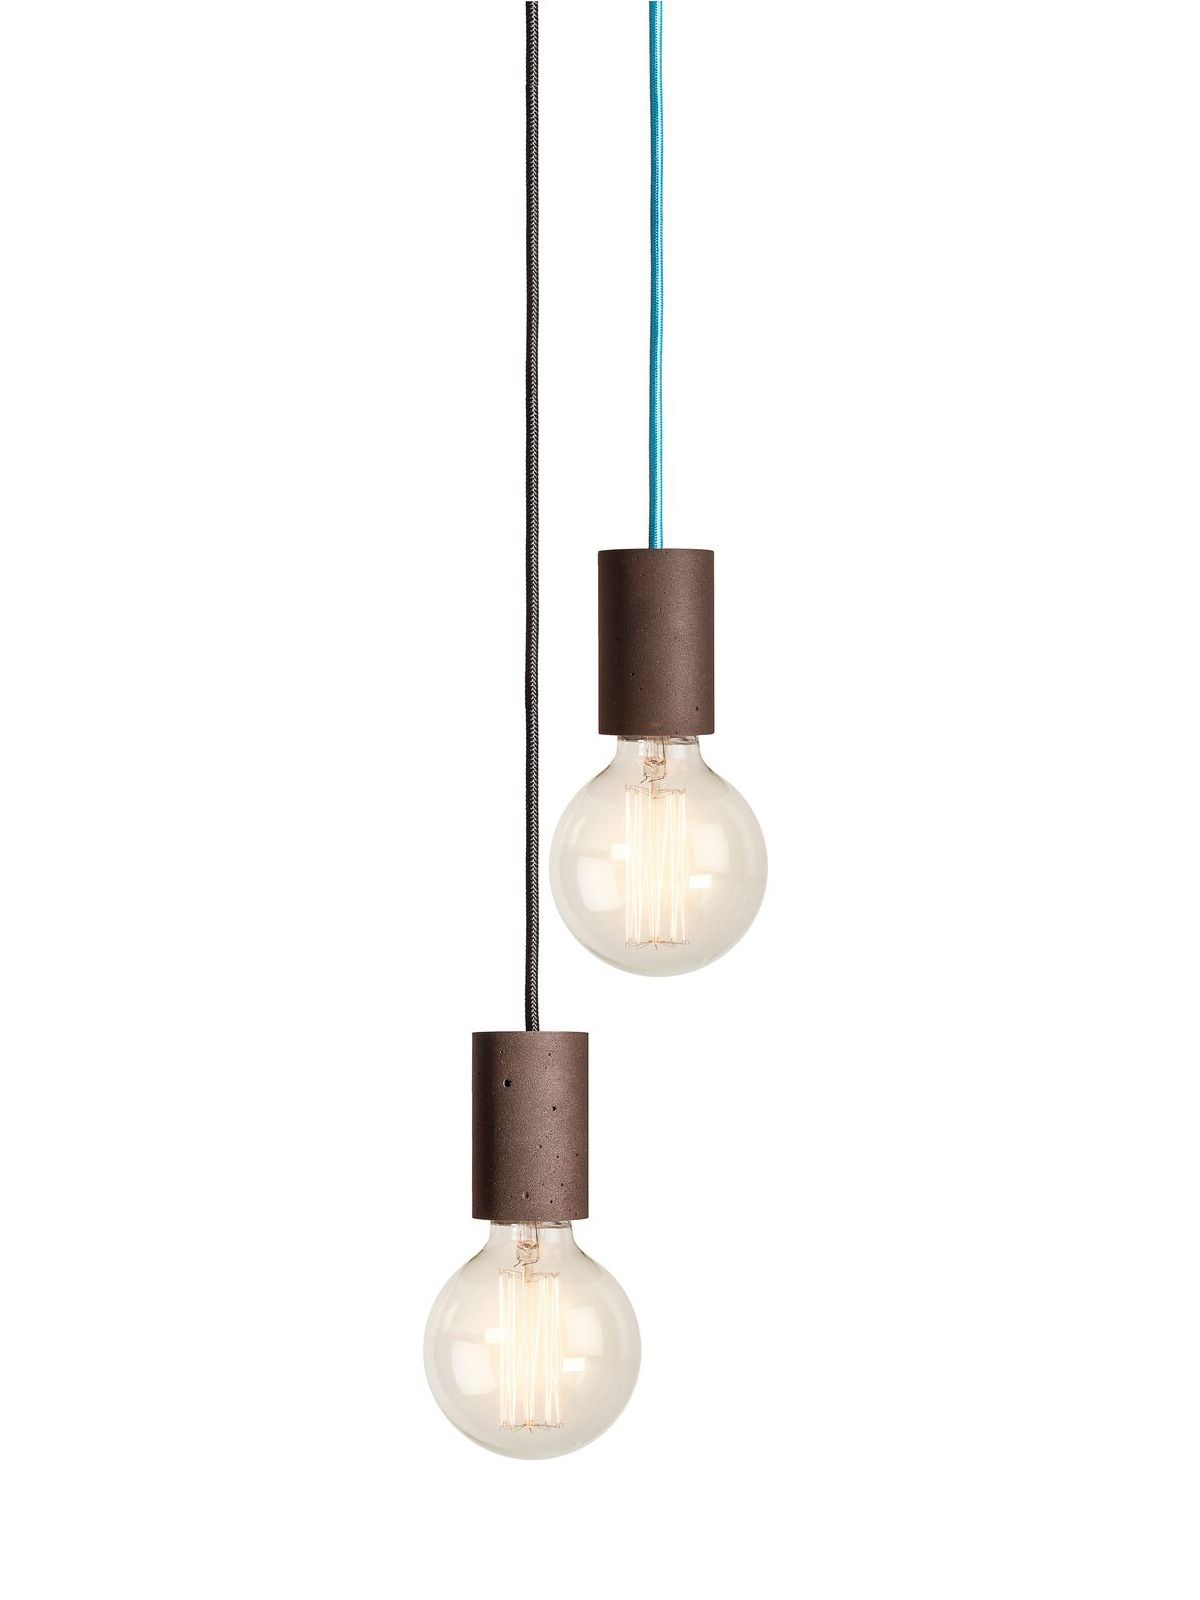 Liu Lampen Aus Naturmaterialien Natural Materials Lampen